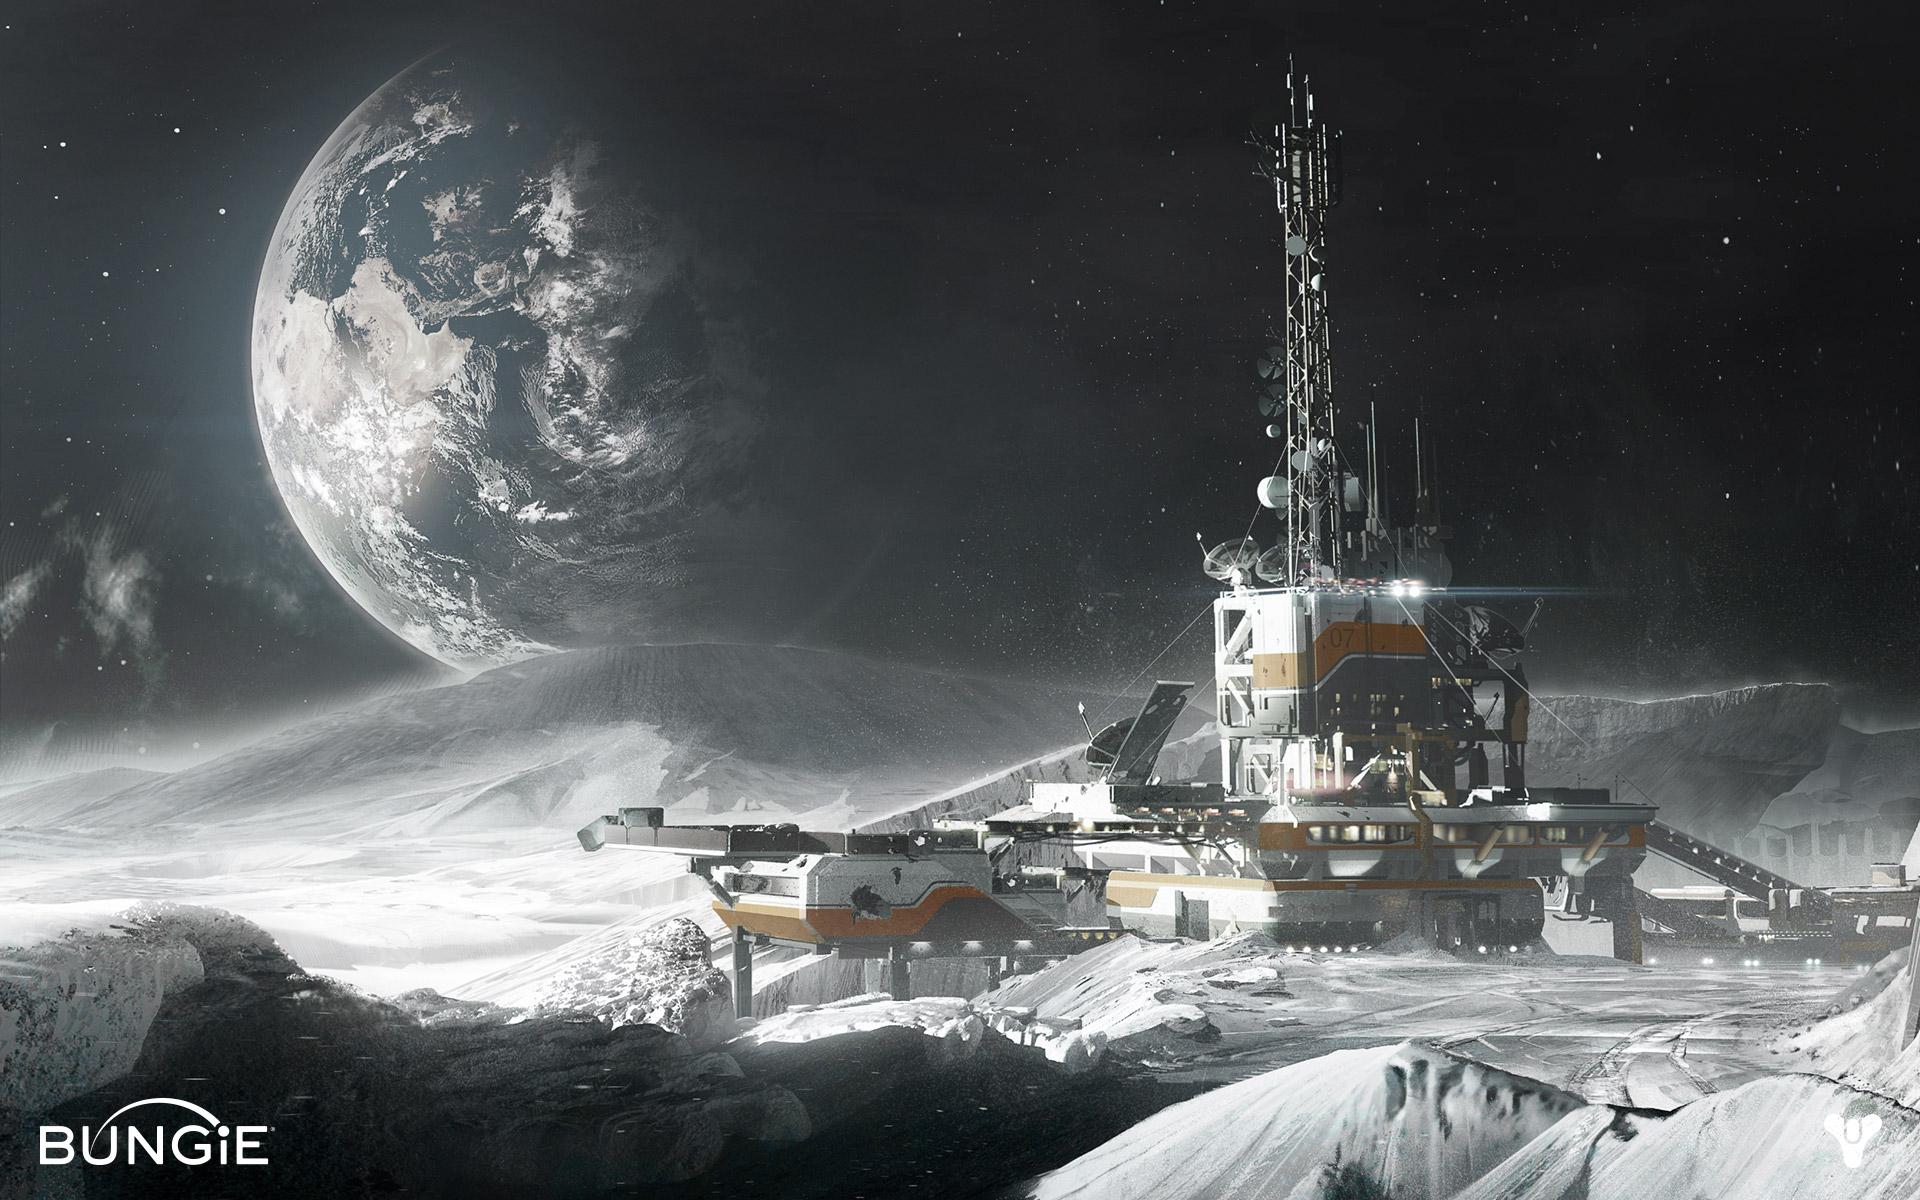 moon base event - photo #18